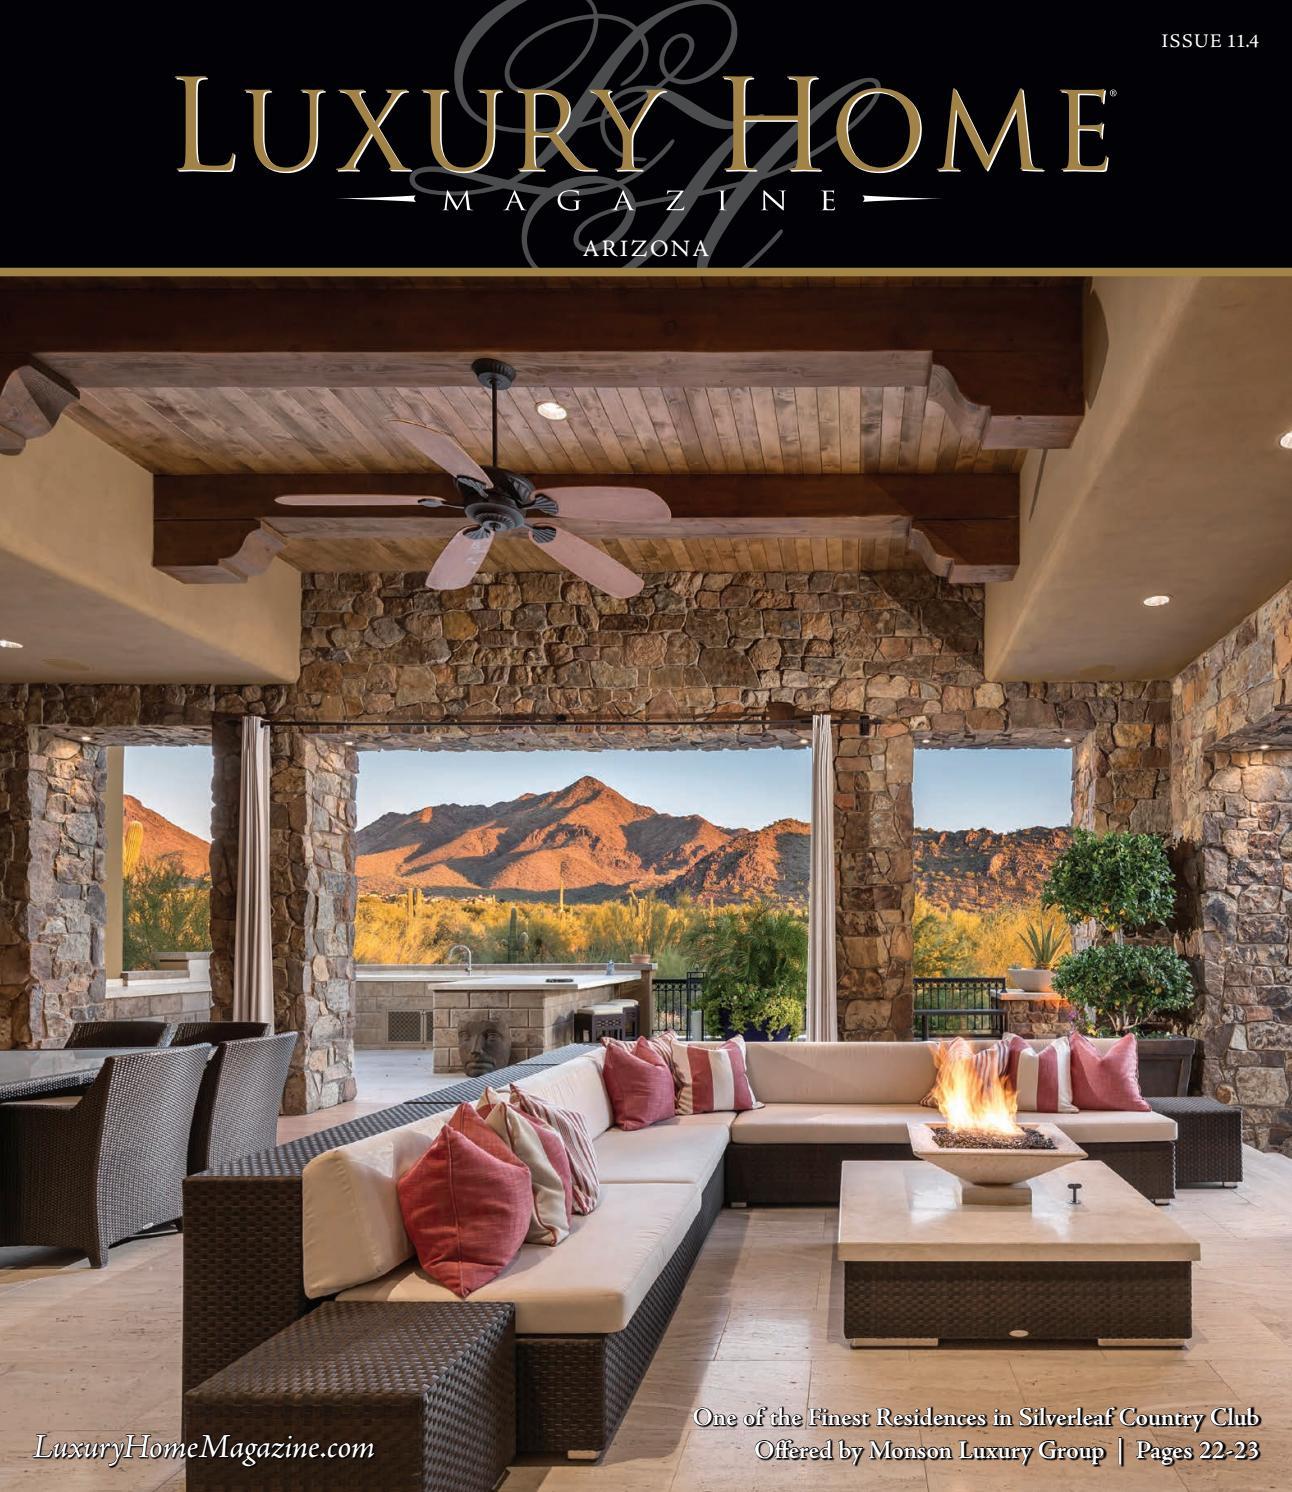 luxury home magazine arizona issue 11 4 by luxury home magazine issuu. Black Bedroom Furniture Sets. Home Design Ideas